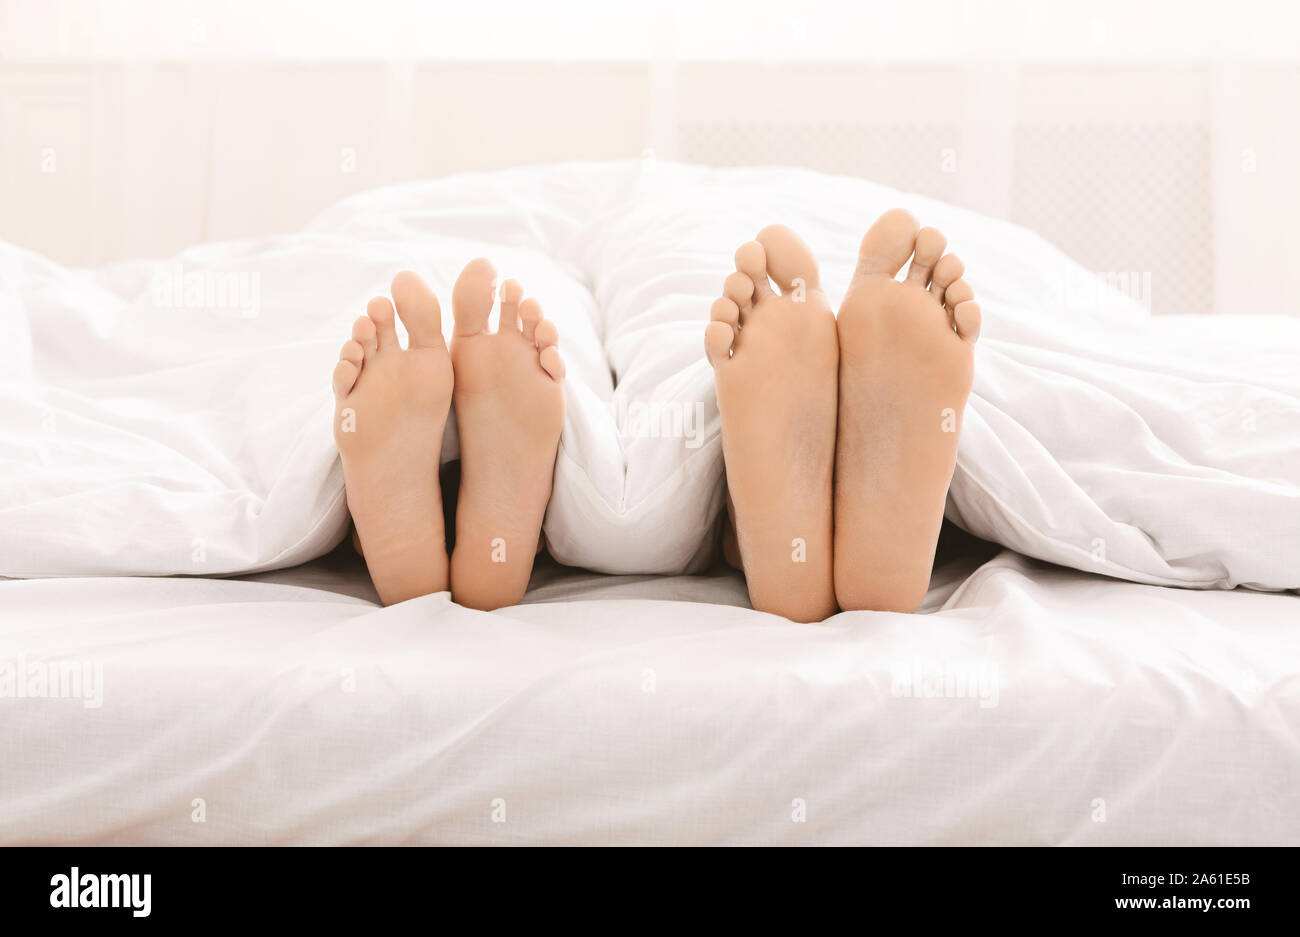 Legs Couple Bed Imágenes De Stock Legs Couple Bed Fotos De